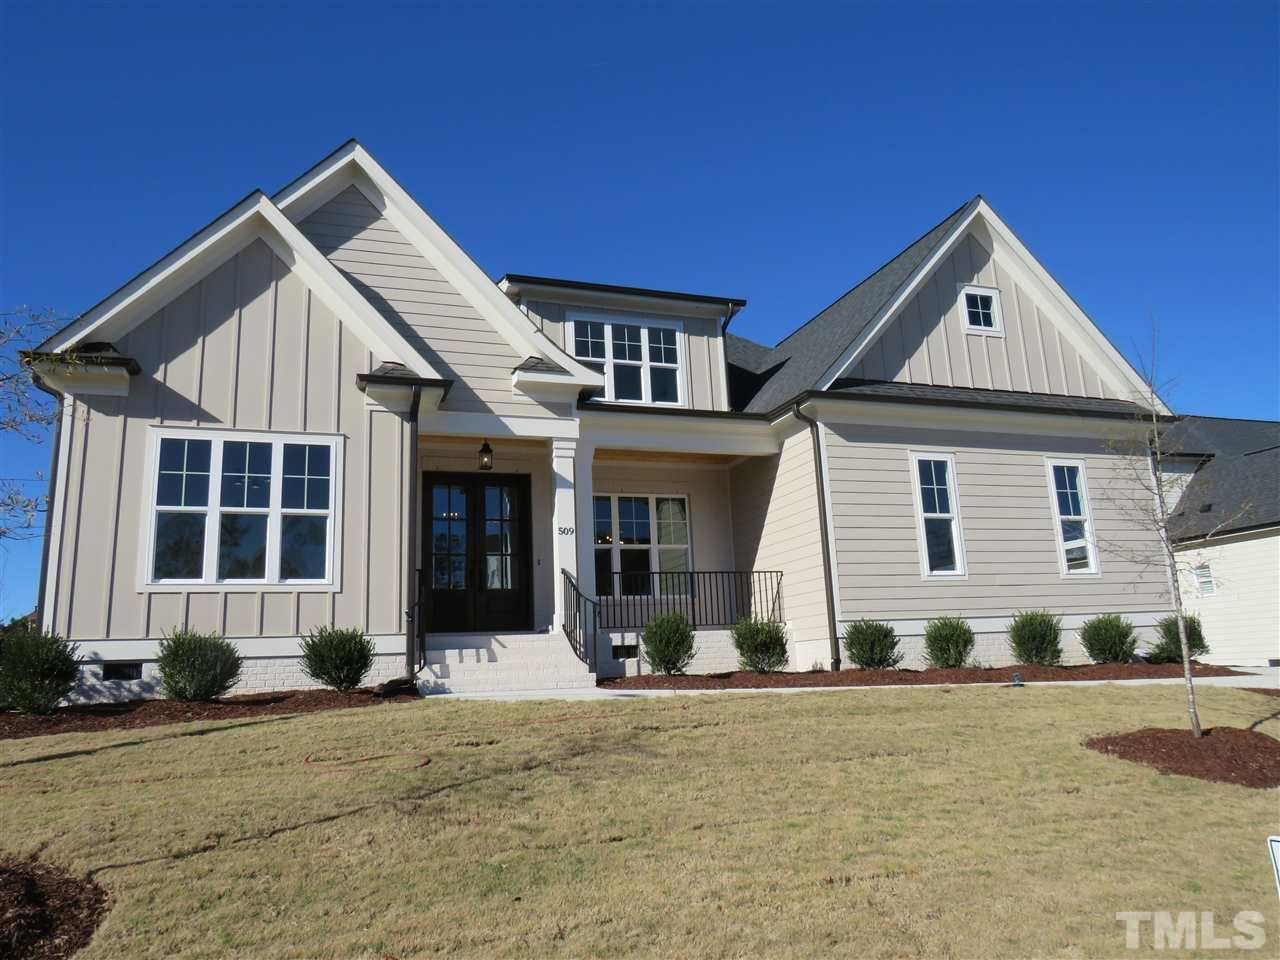 509 Broadly Glen Court, Raleigh, NC 27519-6750 - MLS#: 2332435